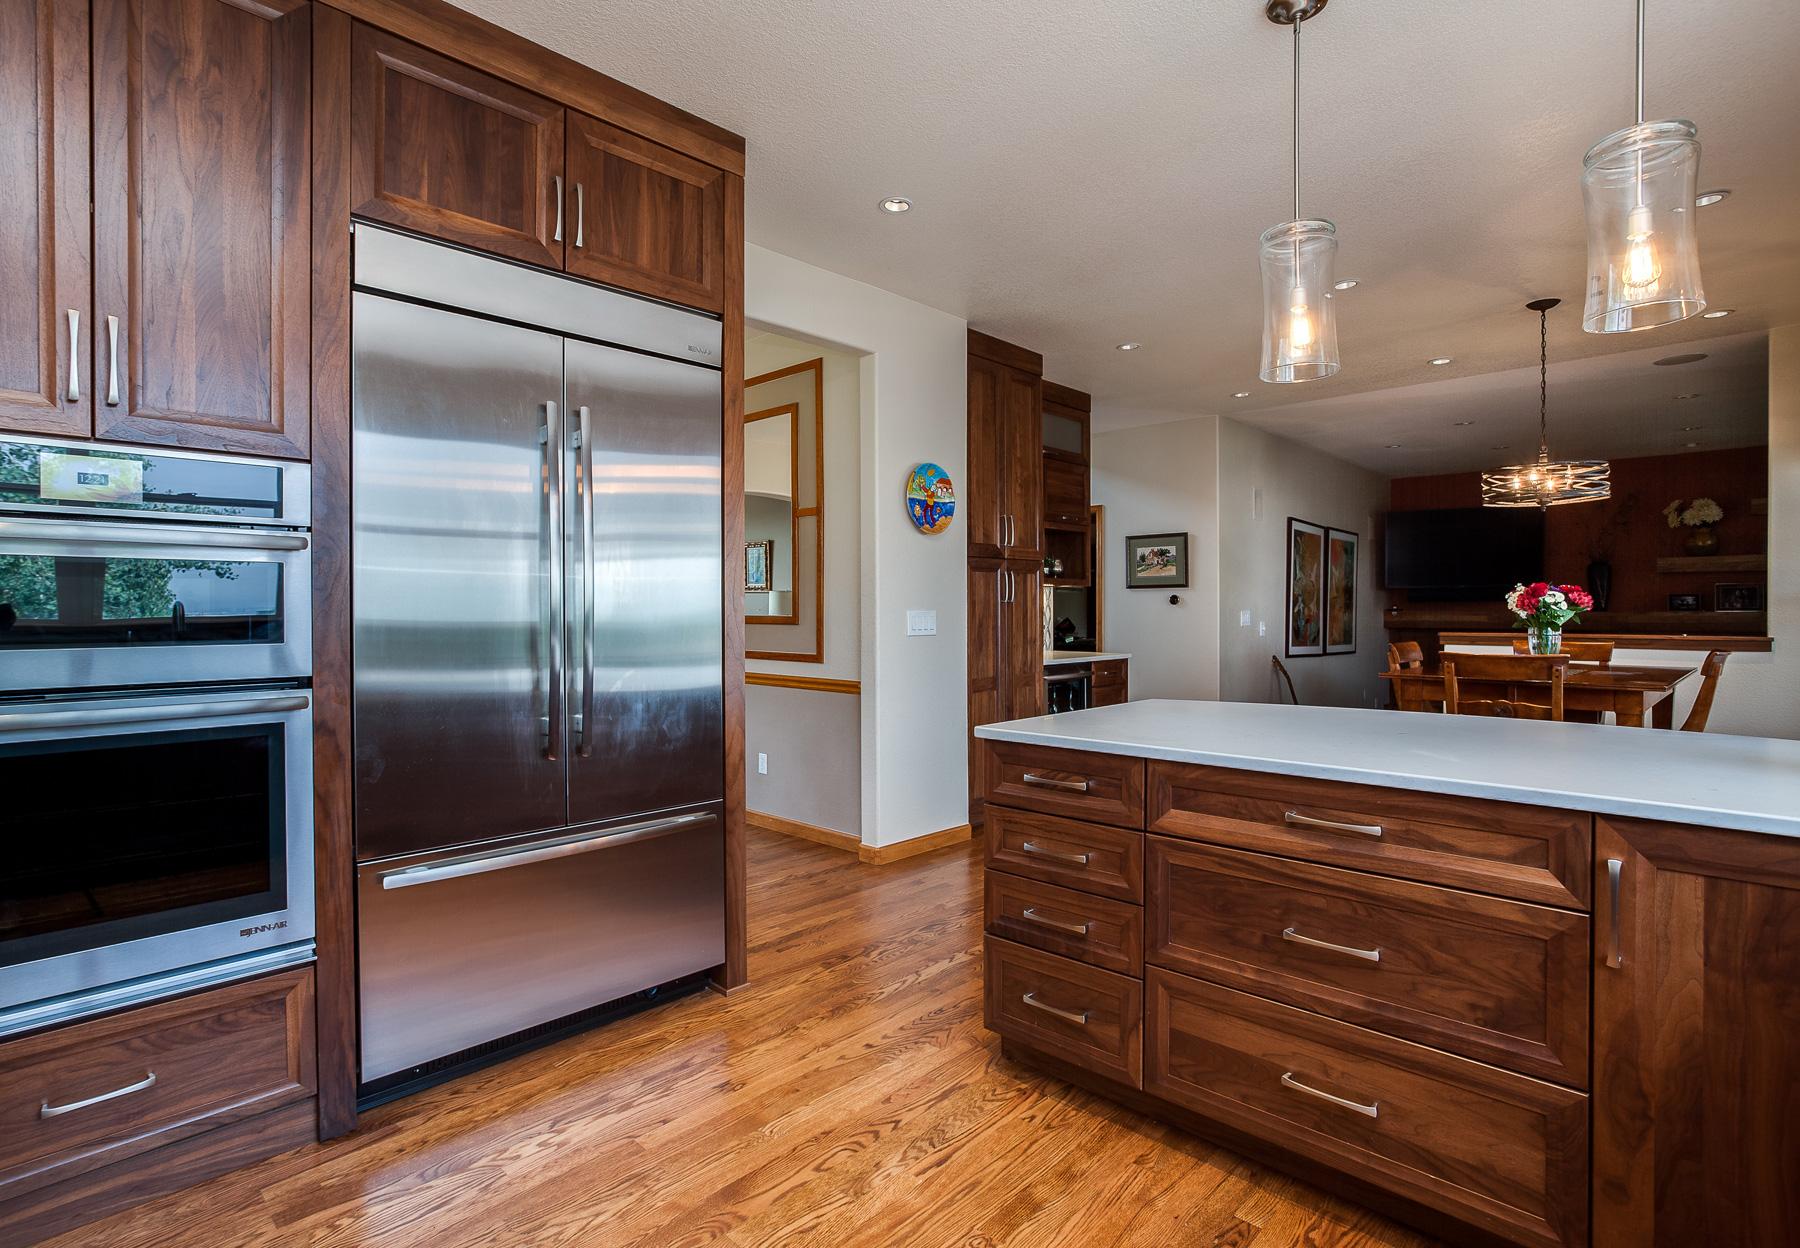 Beautiful Transitional Modern Kitchen Remodel Jm Kitchen And Bath Design